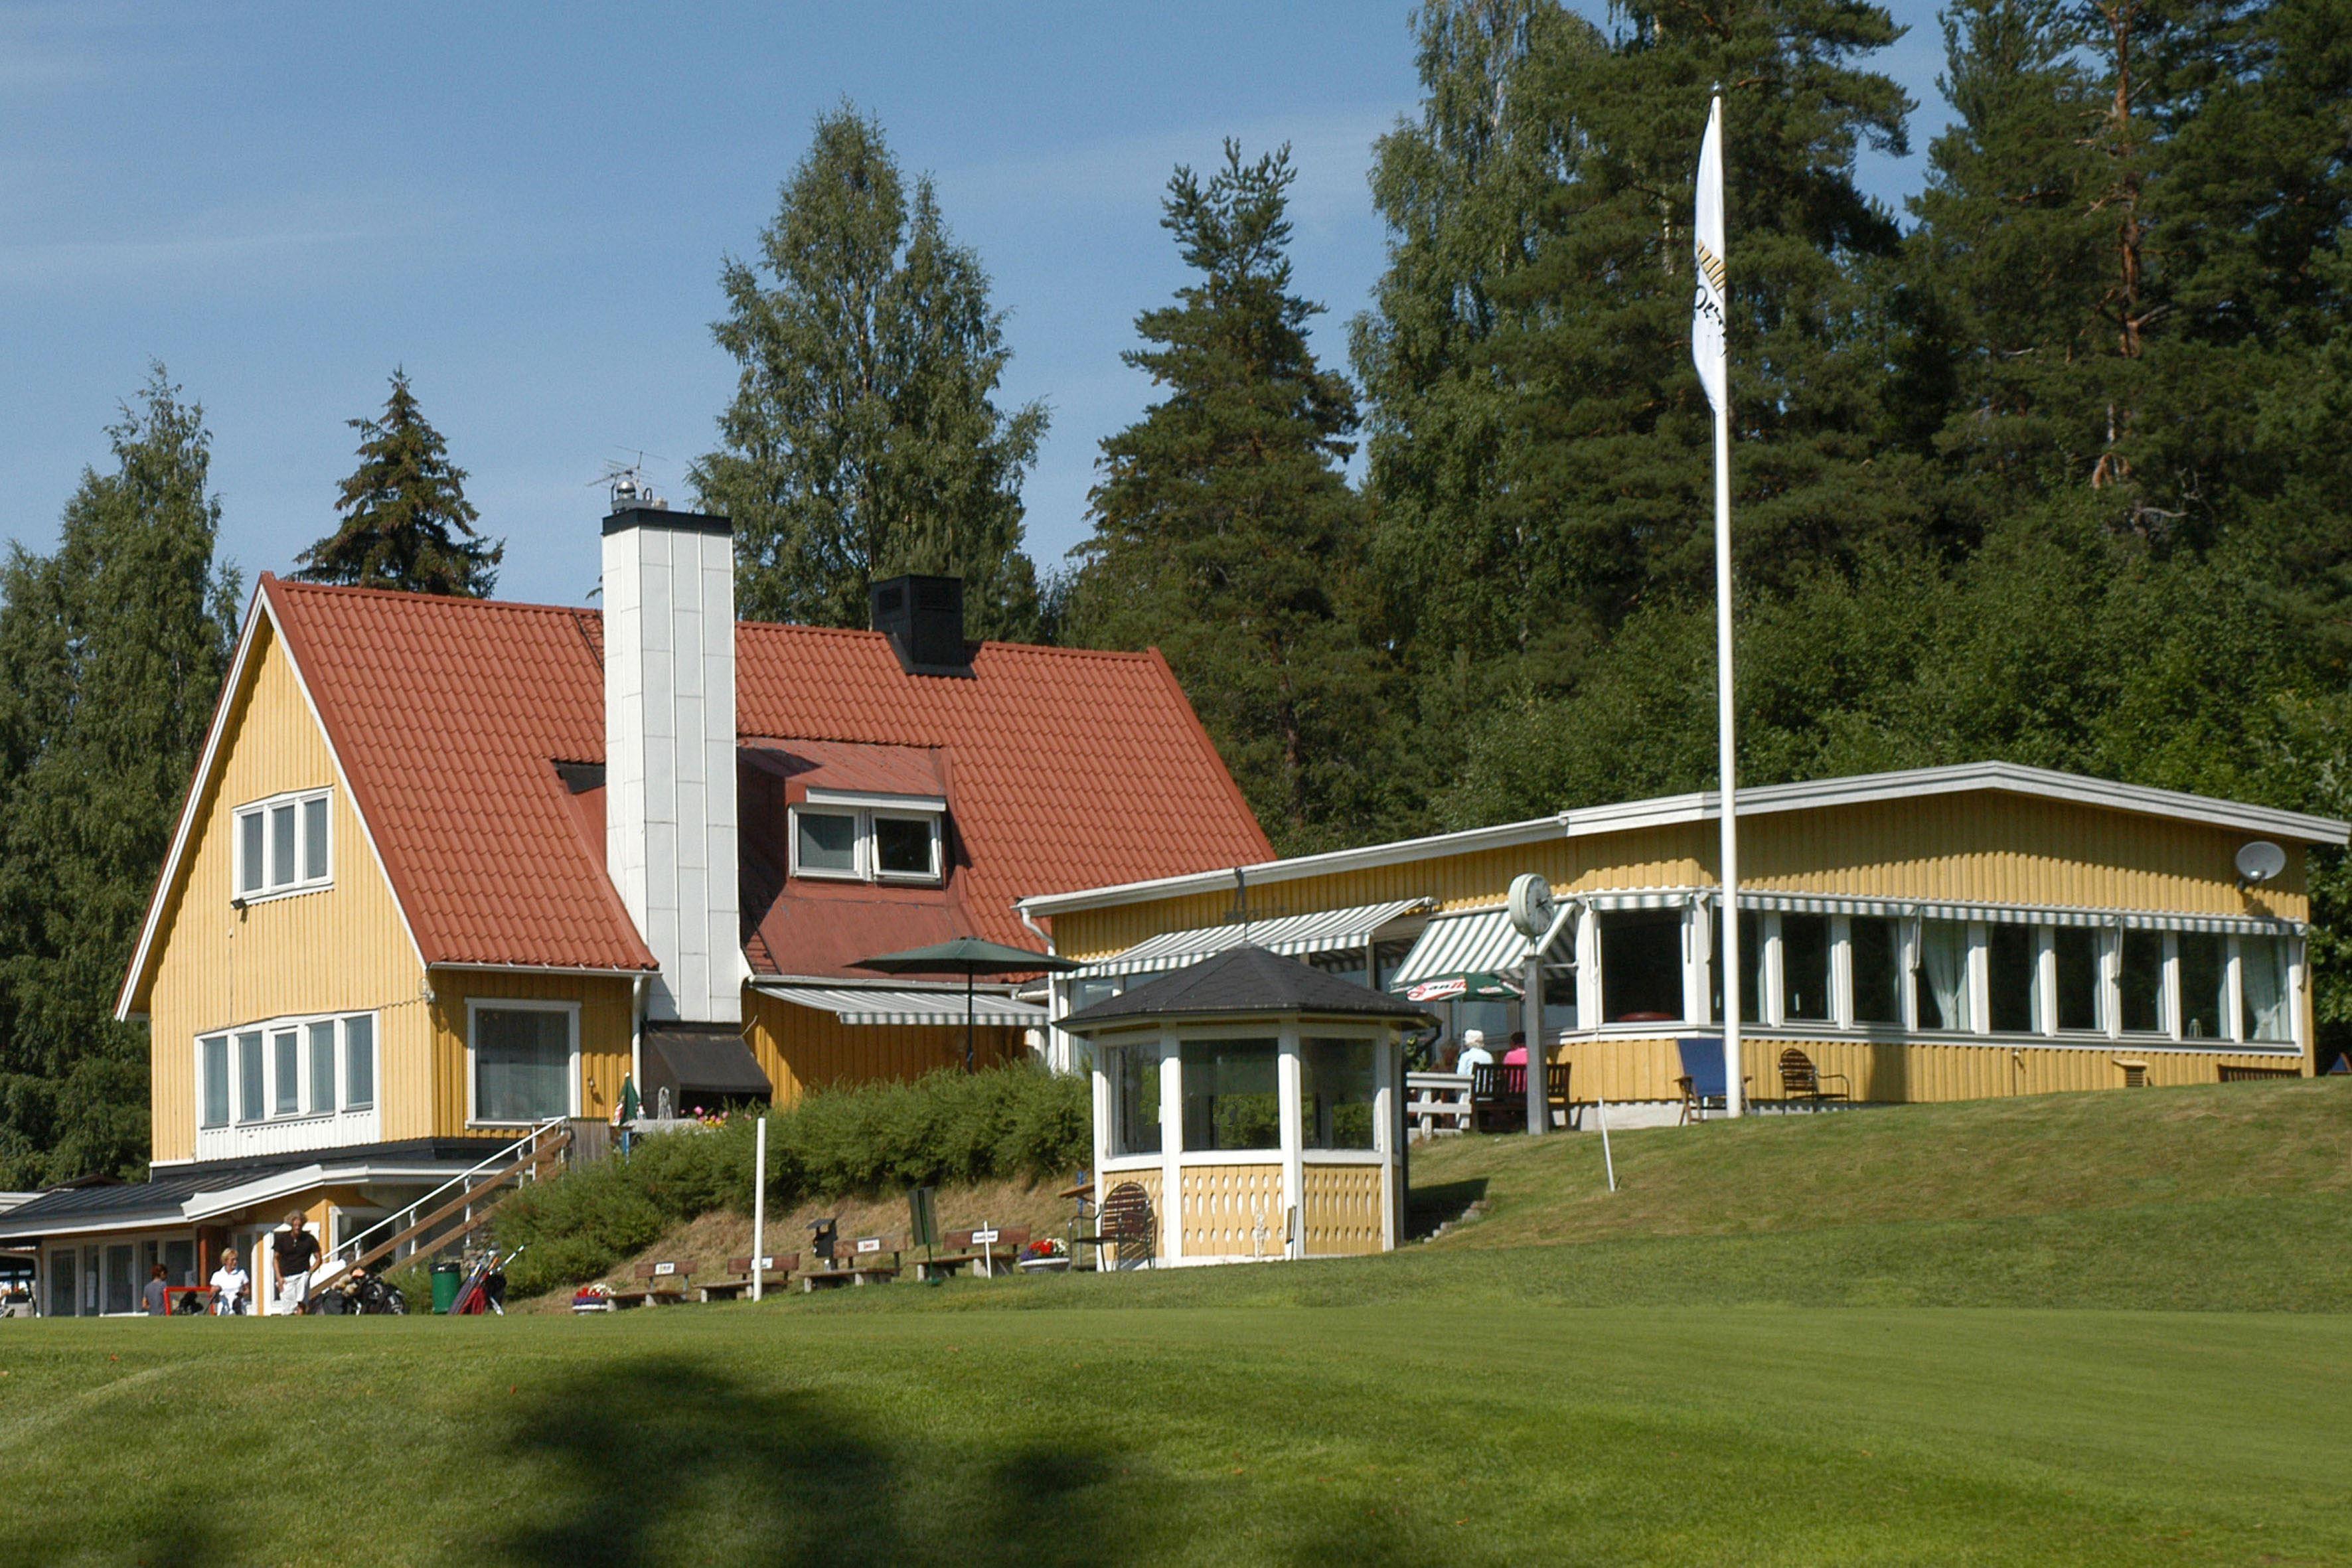 Sundsvall Golf course